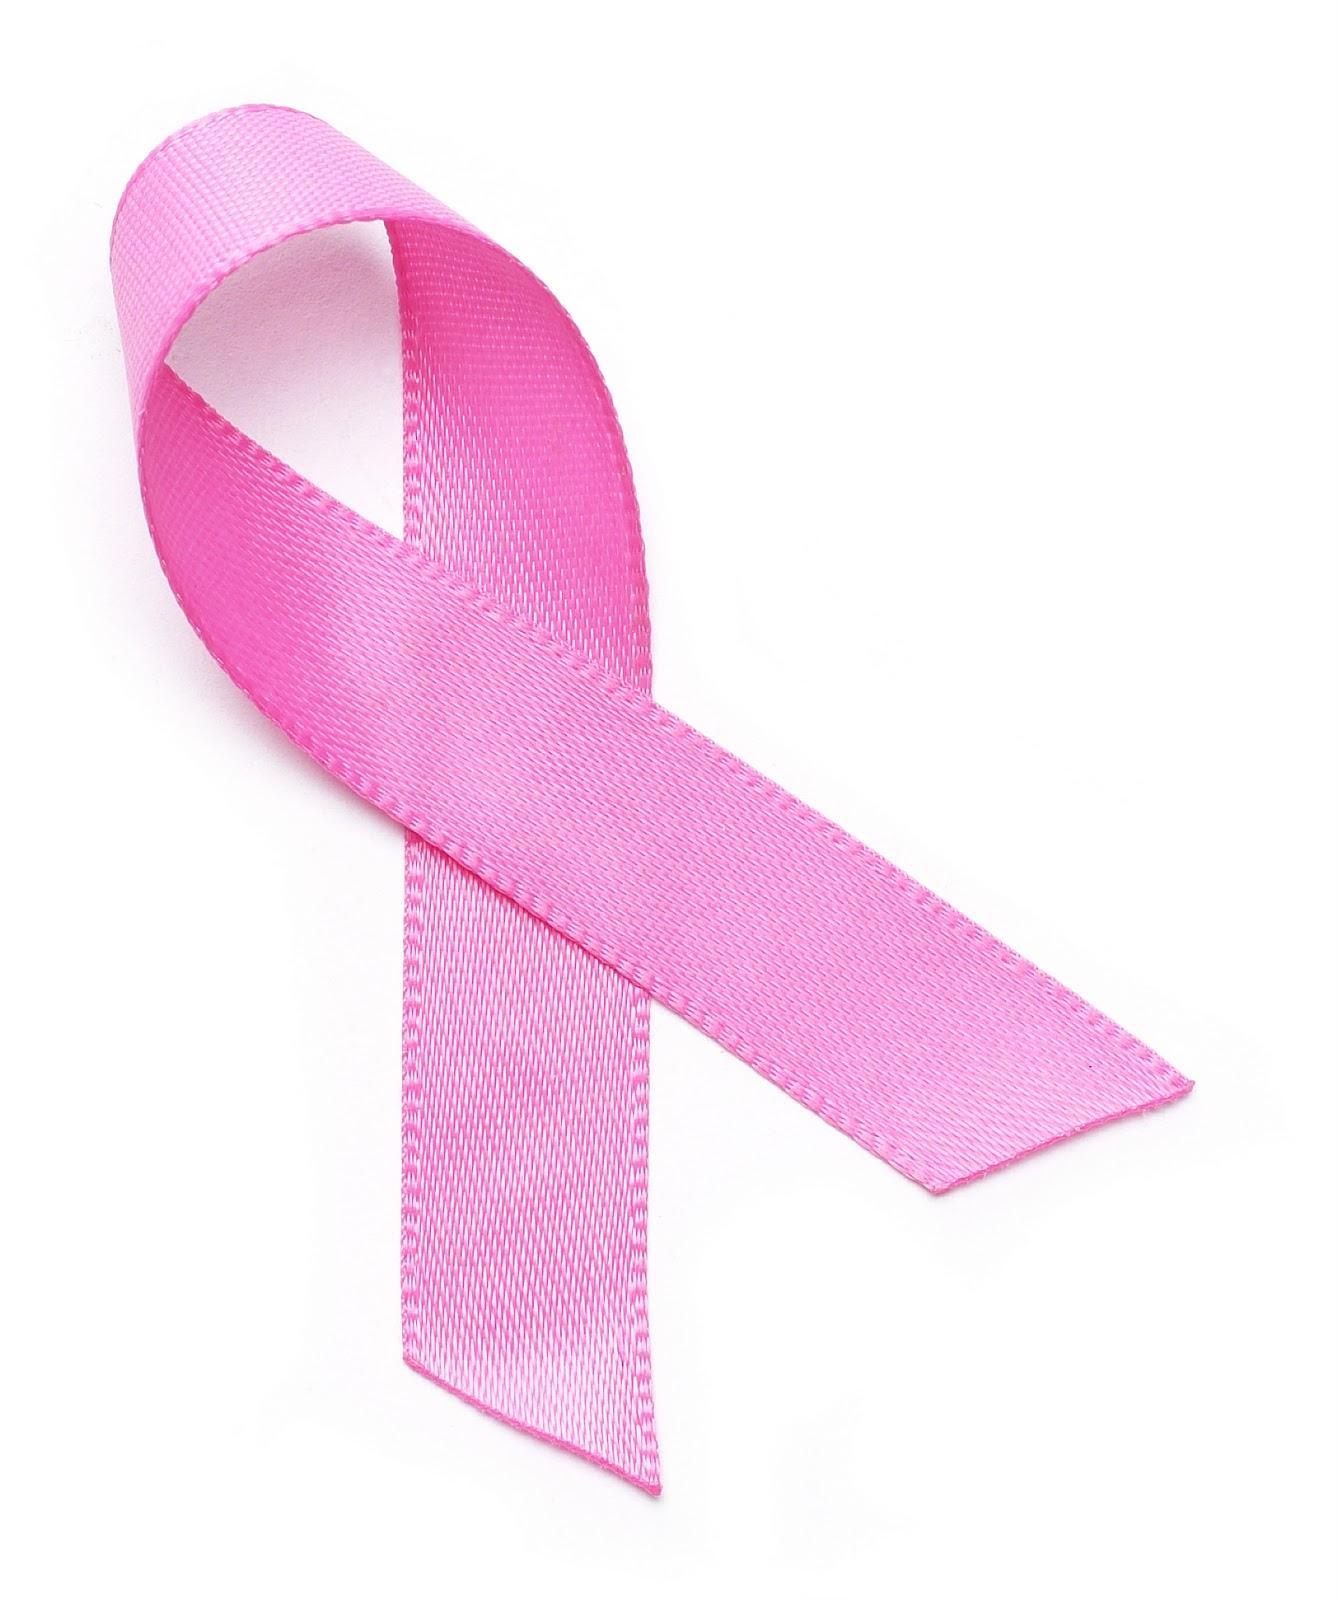 1338x1600 Komen Pink Ribbon Clip Art